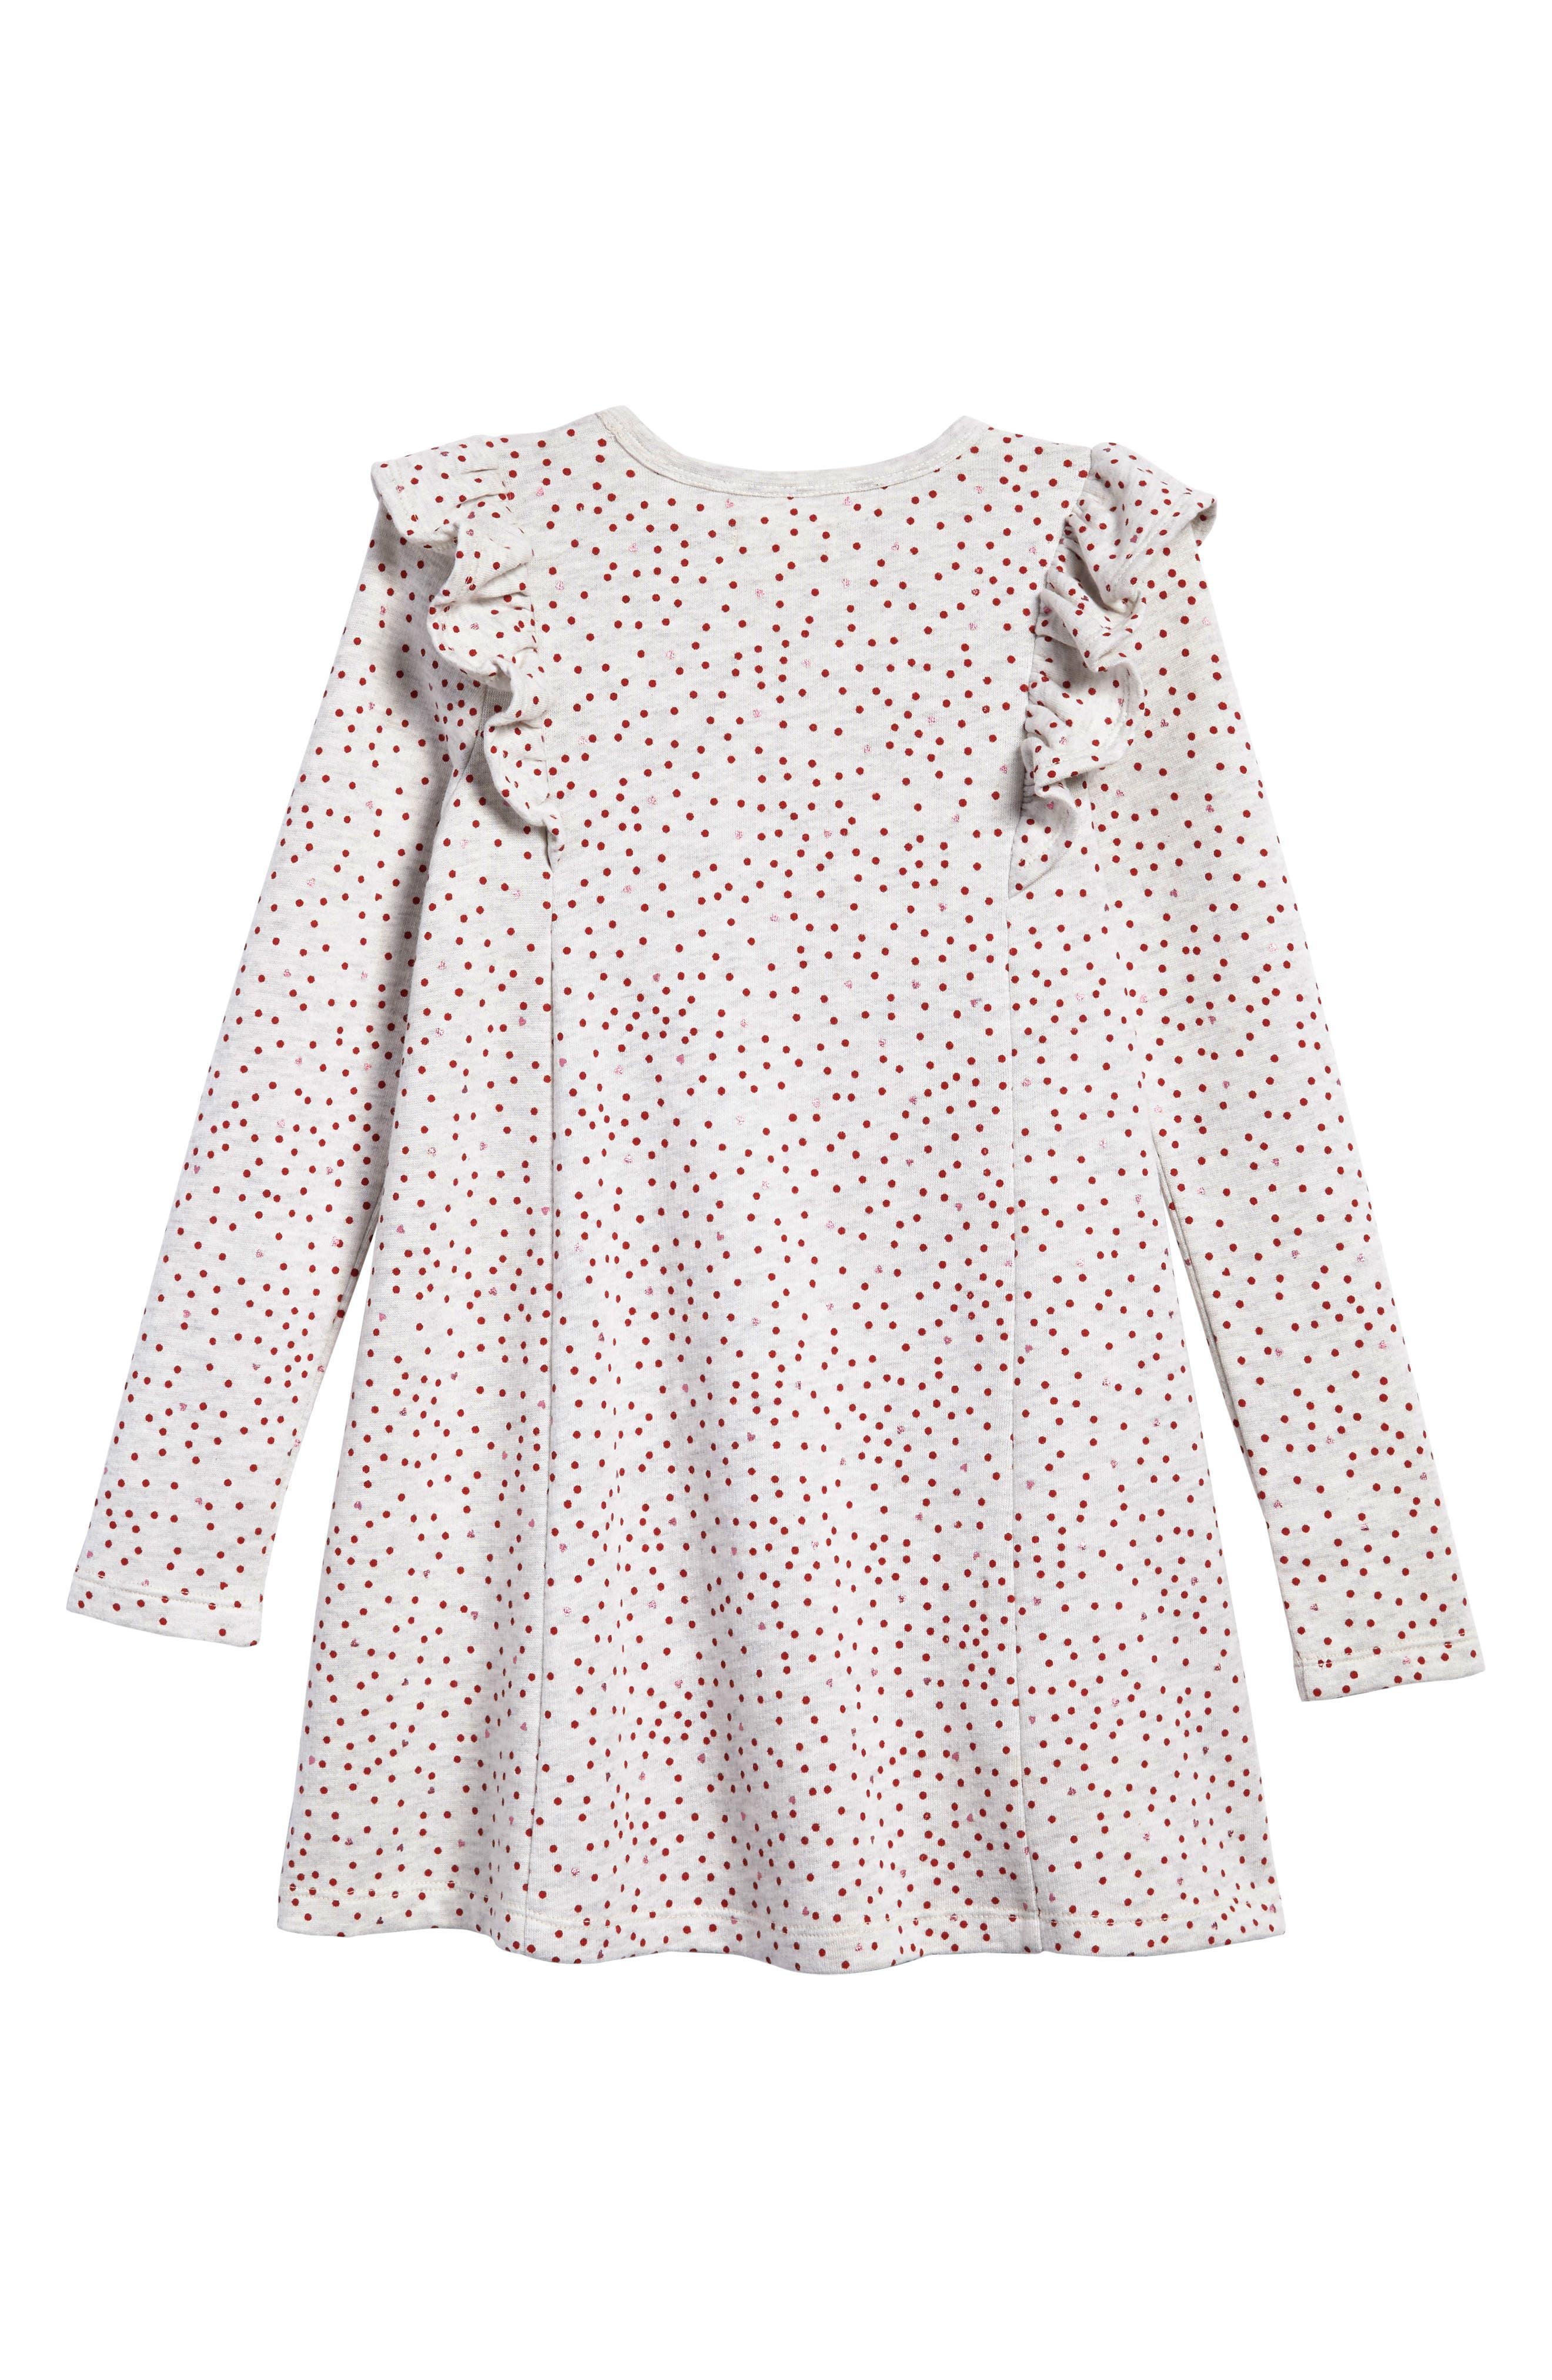 Ruffle Fleece Sweater Dress,                             Alternate thumbnail 2, color,                             IVORY EGRET HEATHER HEARTS